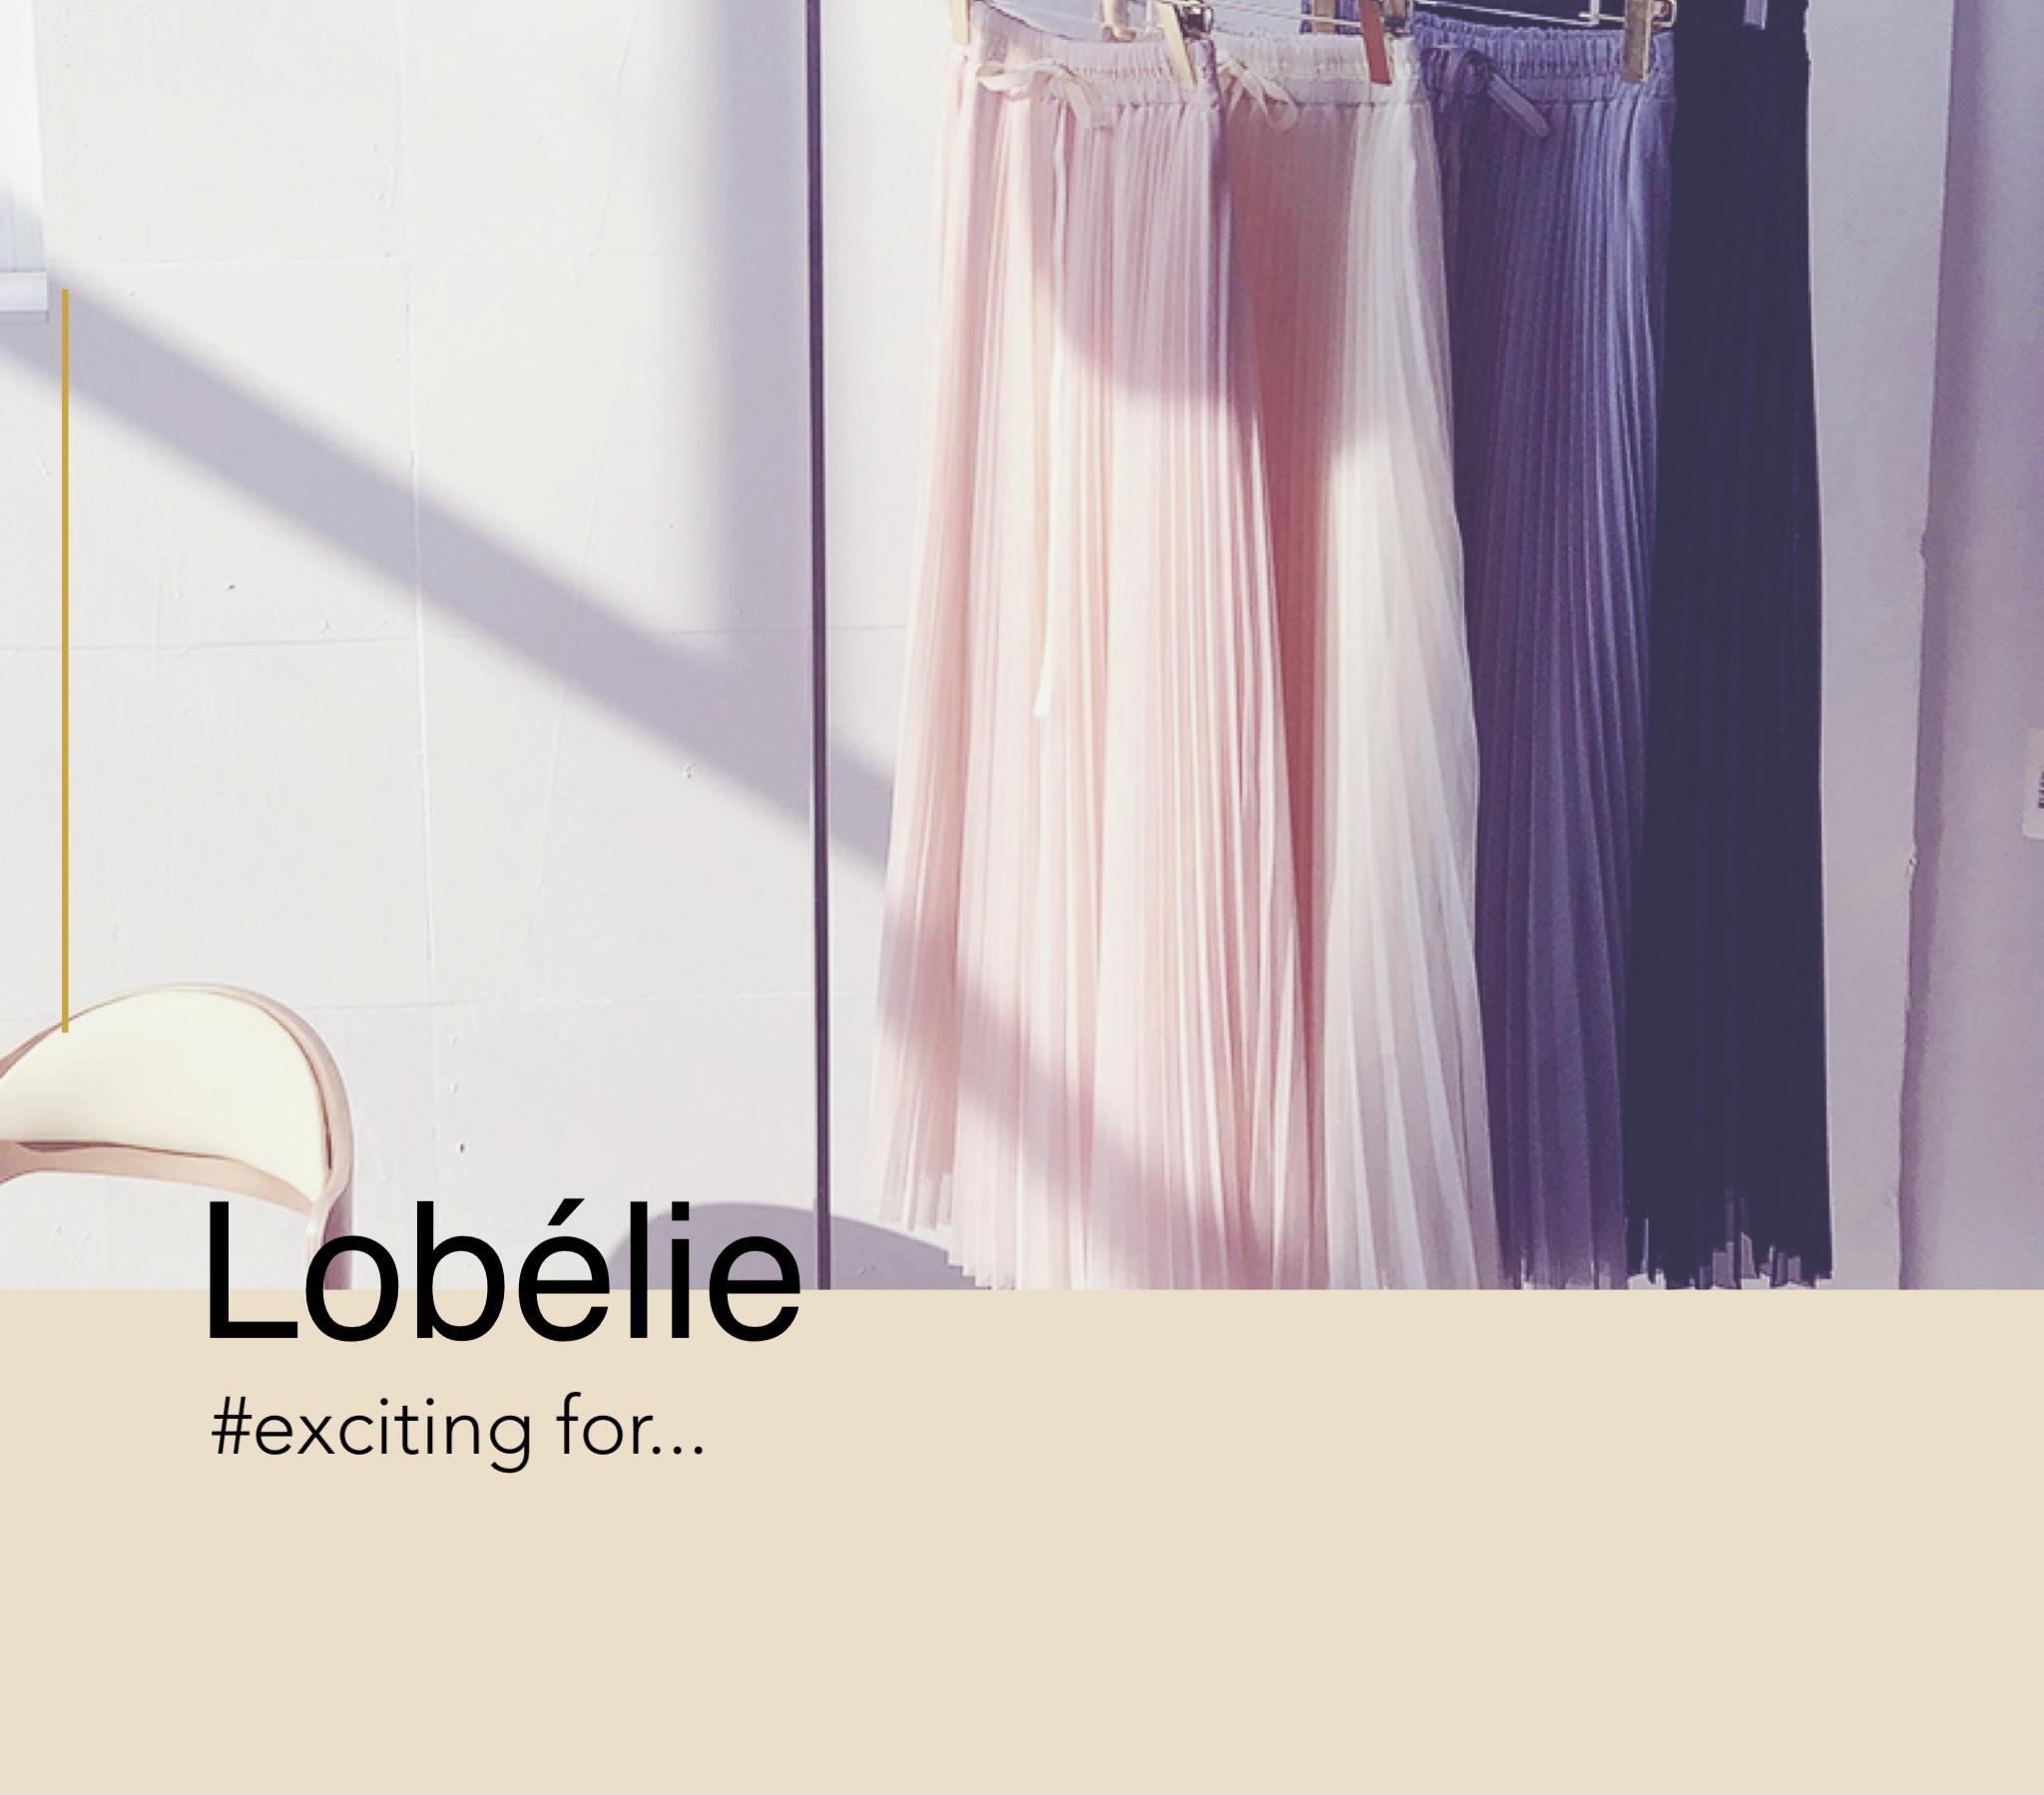 Welcome to Lobèlie ★☆☆ご注文前お読みください☆☆★